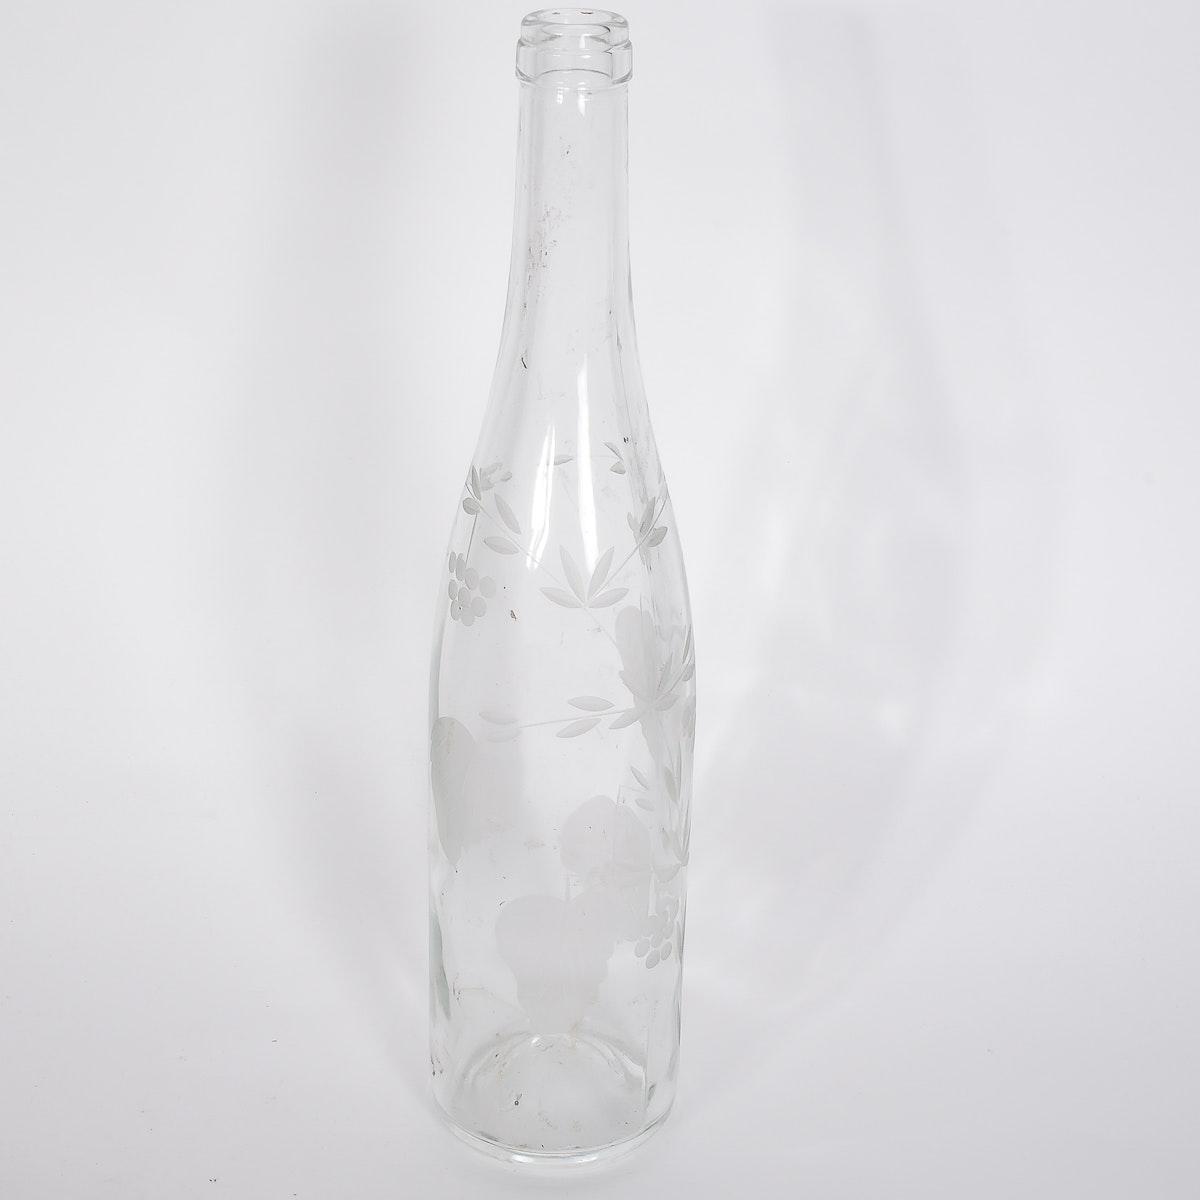 Antique Etched Glass Bottle